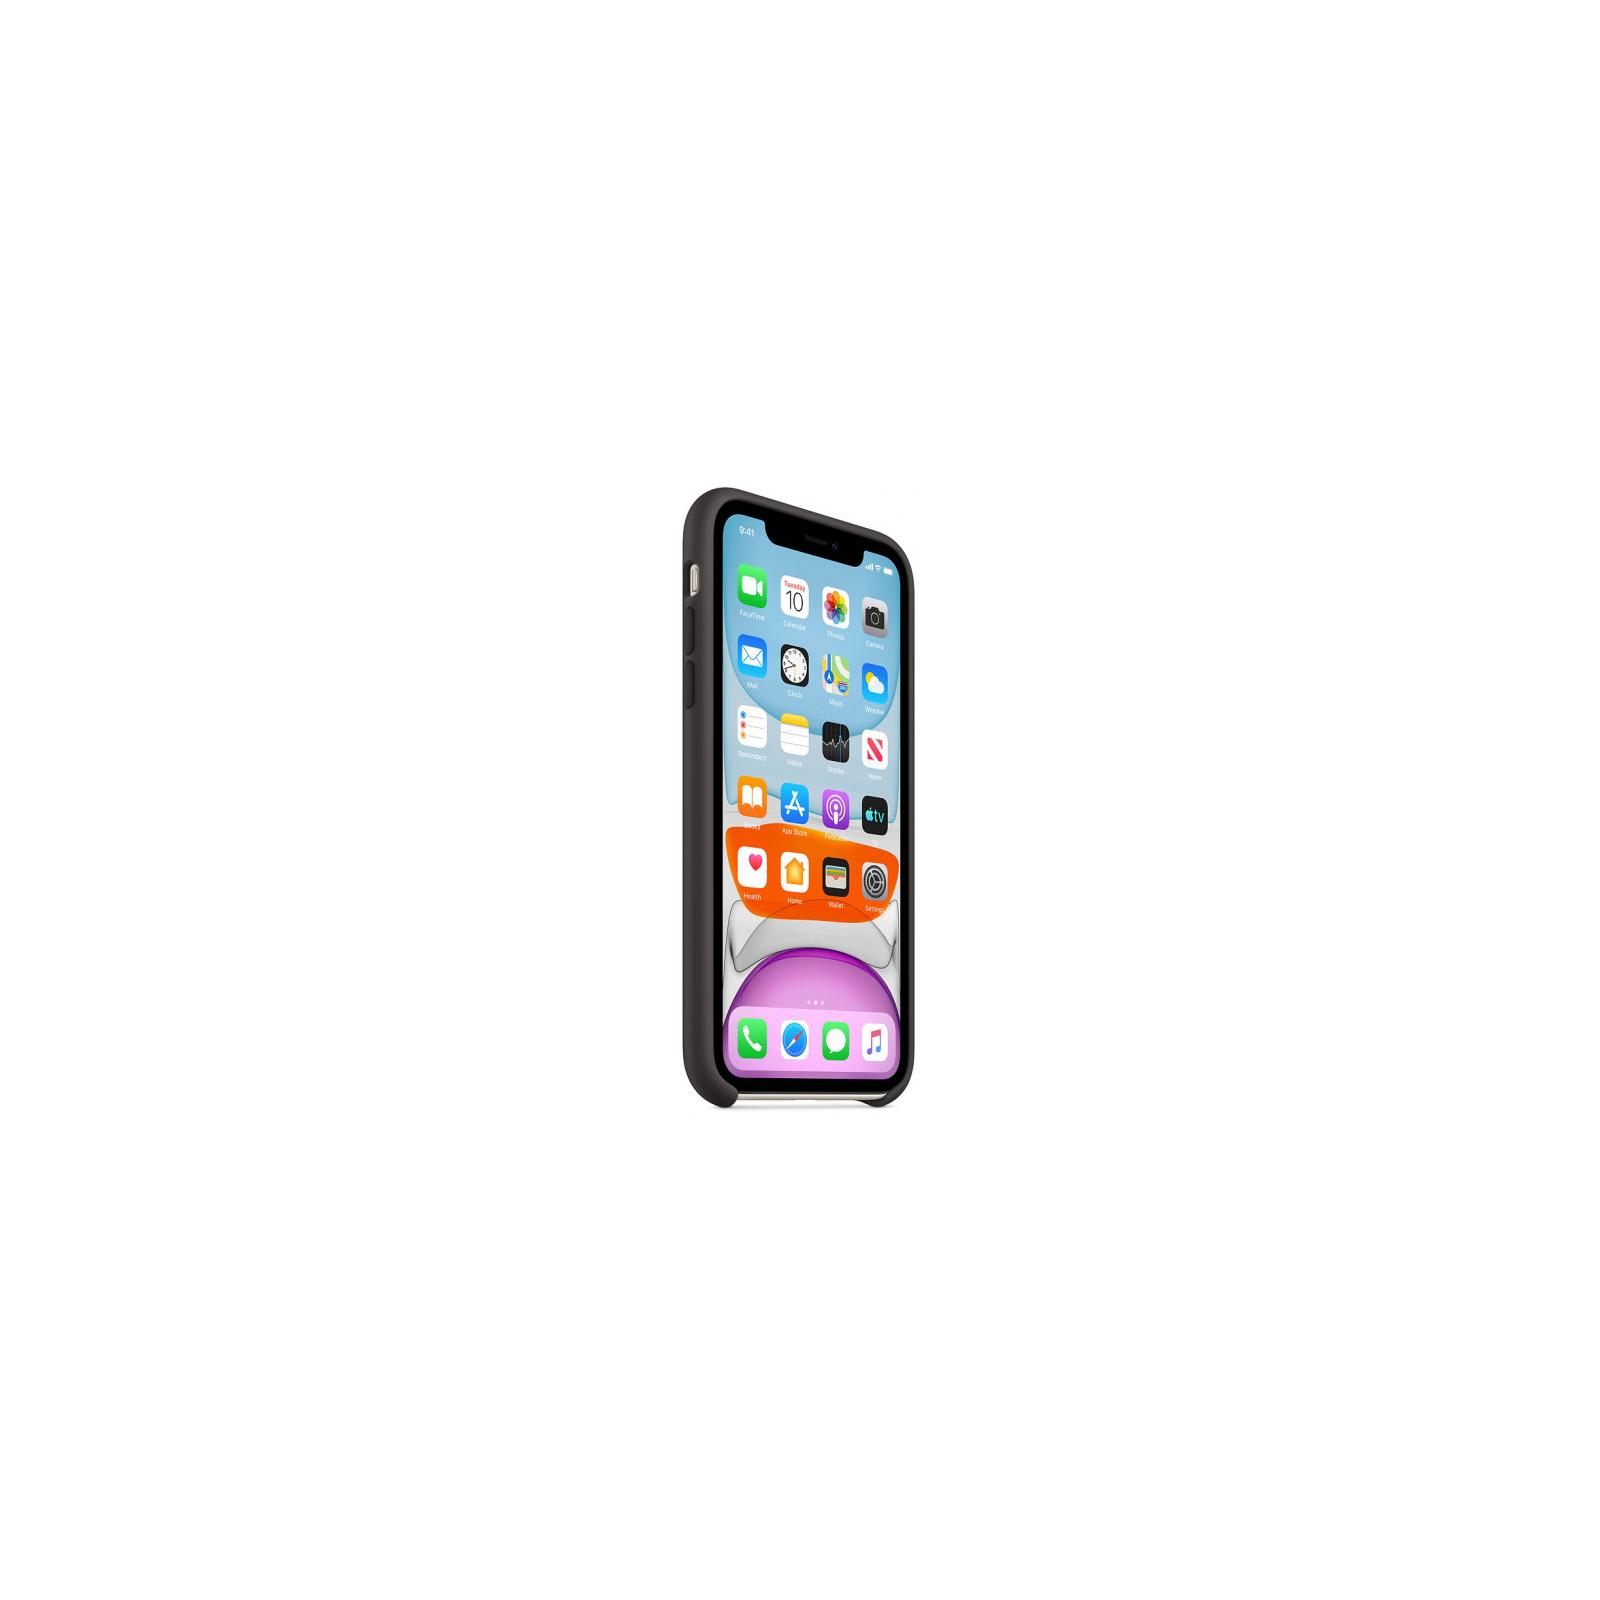 Чехол для моб. телефона Apple iPhone 11 Silicone Case - Black (MWVU2ZM/A) изображение 7